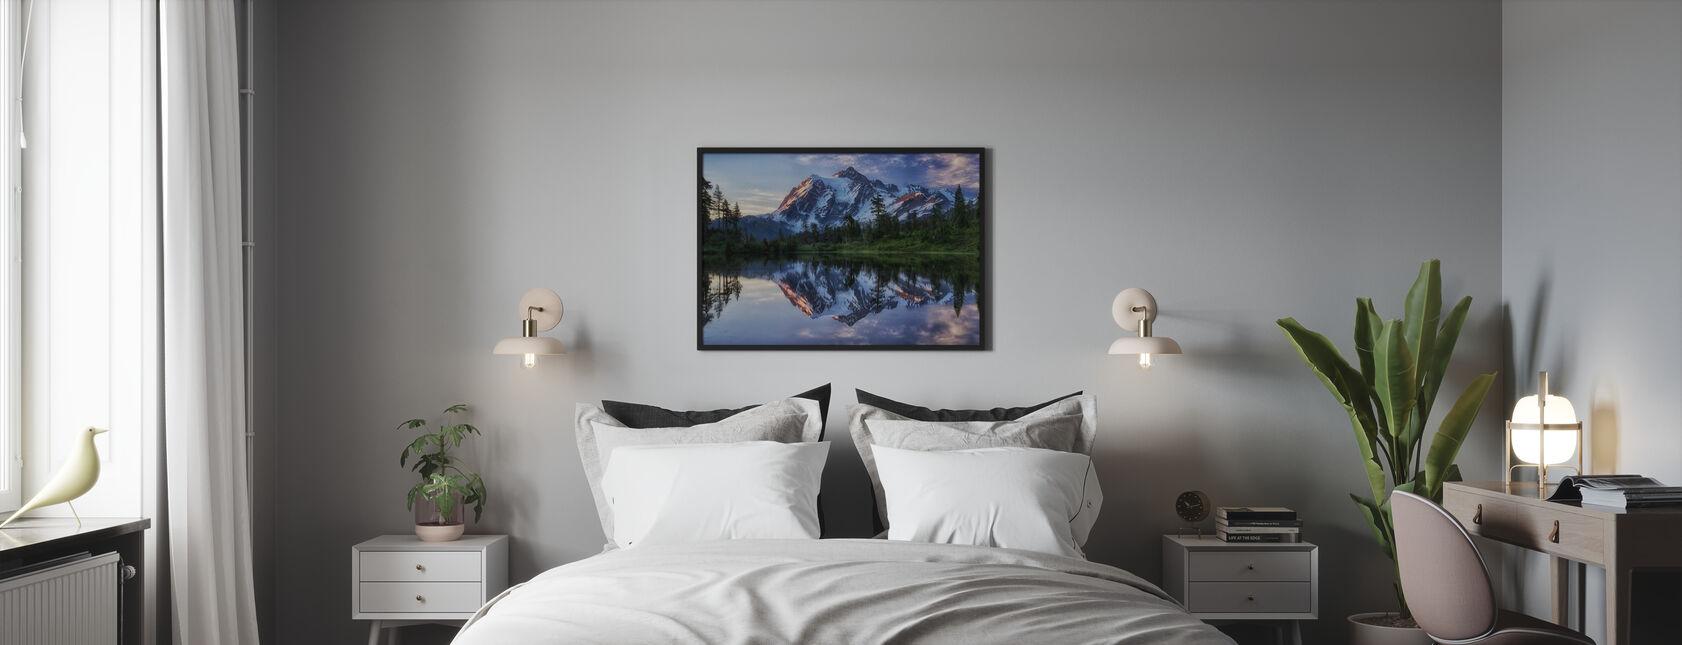 Sunrise on Mount Shuksan, Washington, USA - Poster - Bedroom